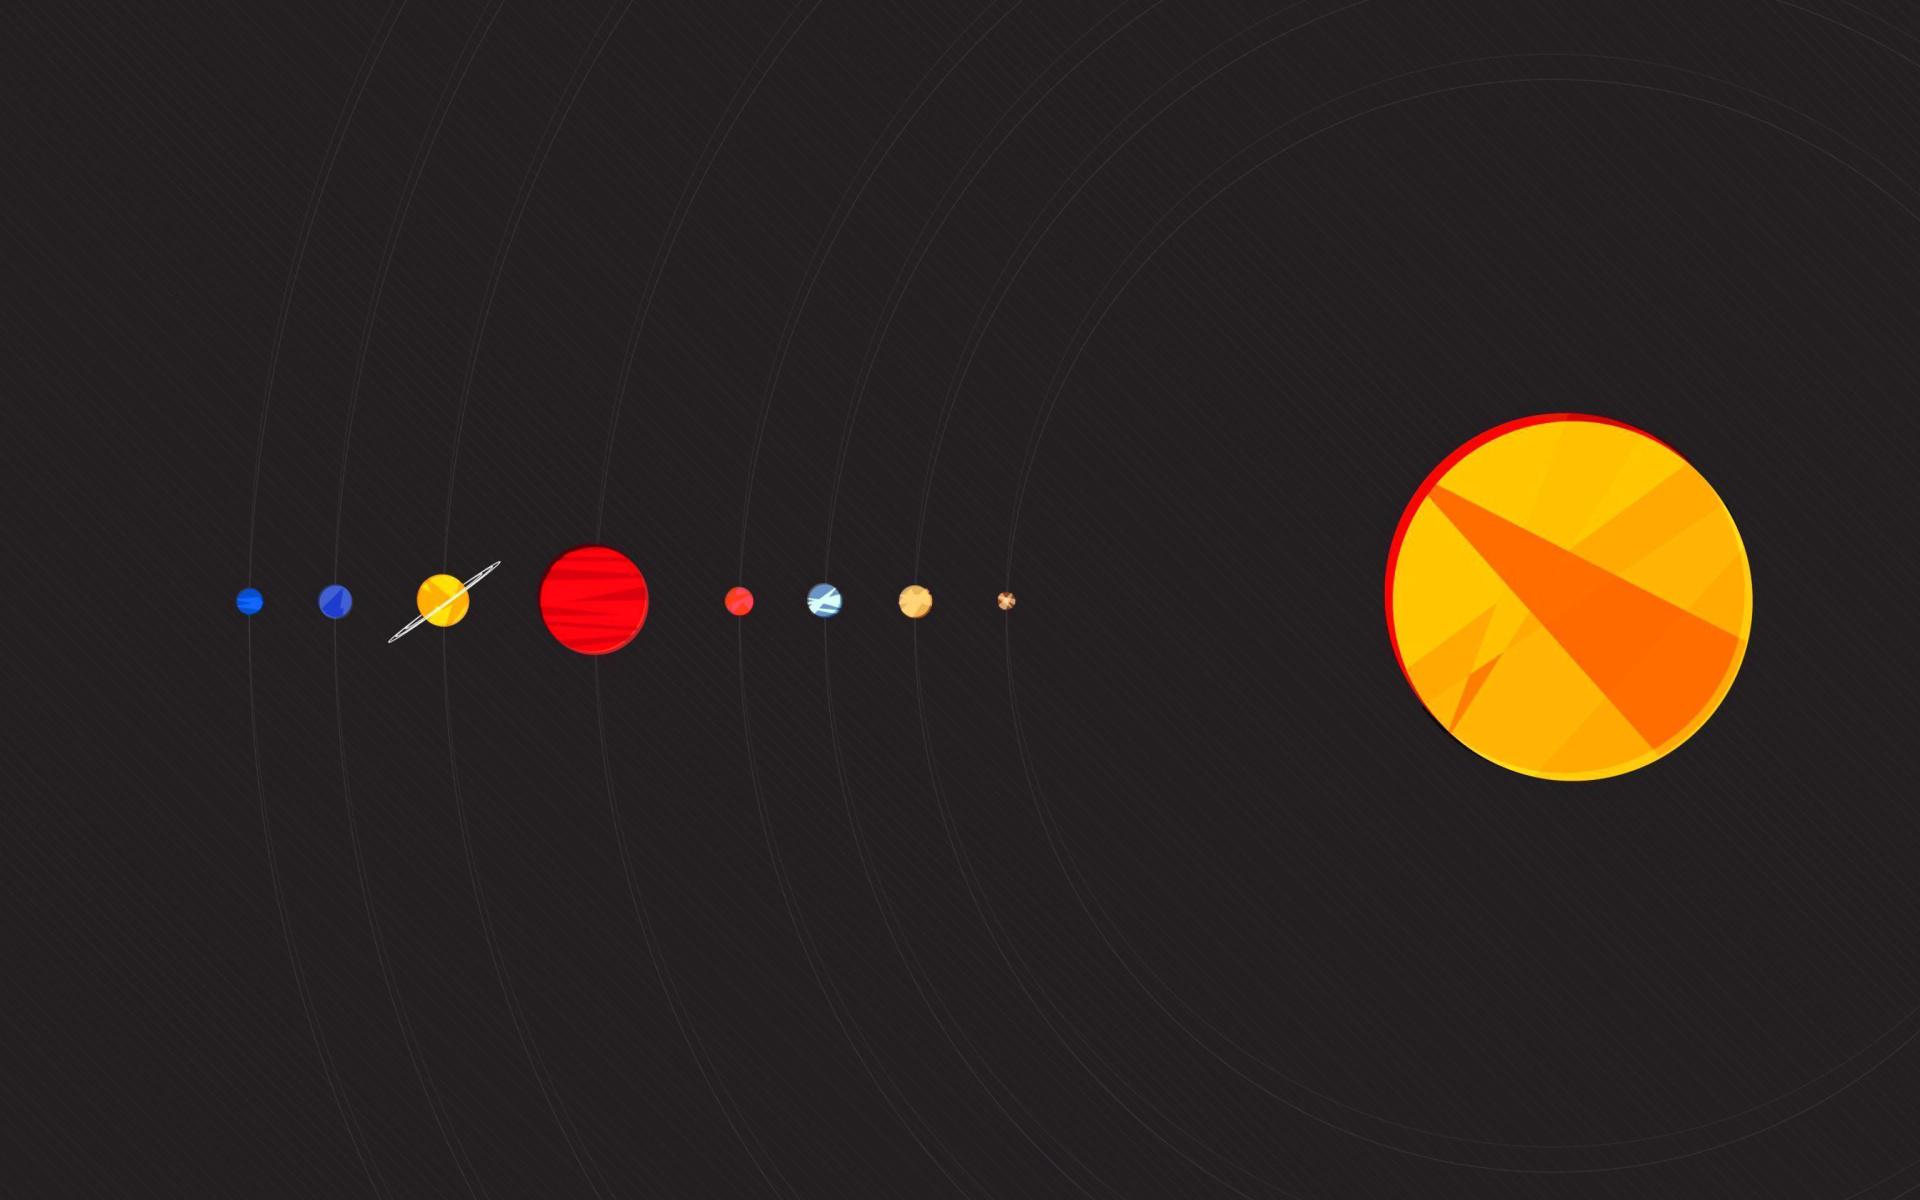 solar system 1920x1080 wallpaper - photo #24